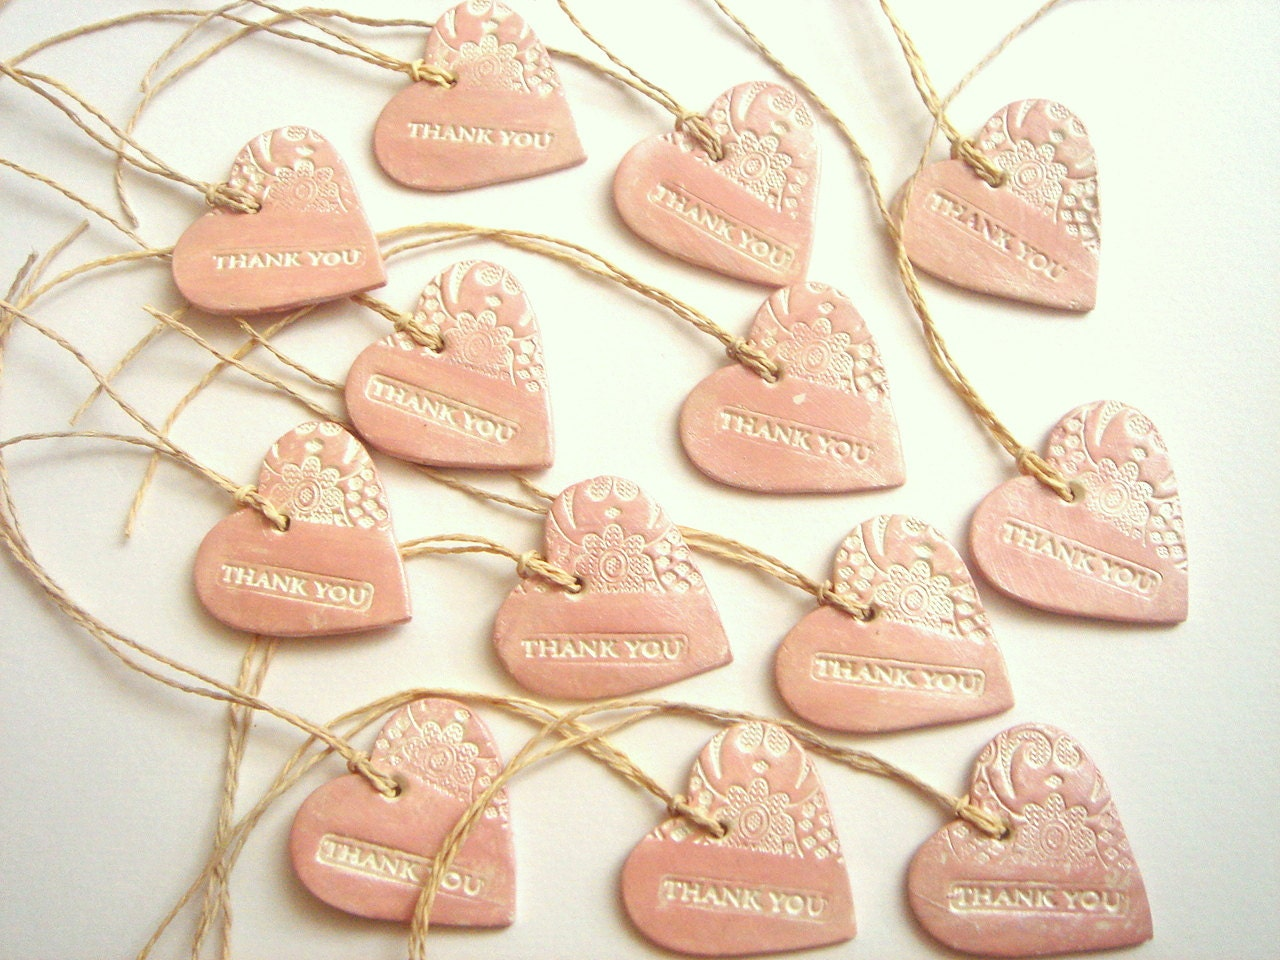 Wedding Favour Gift Tags Australia : 285 15 kb jpeg wedding thank you tag damask black 2 wedding ...